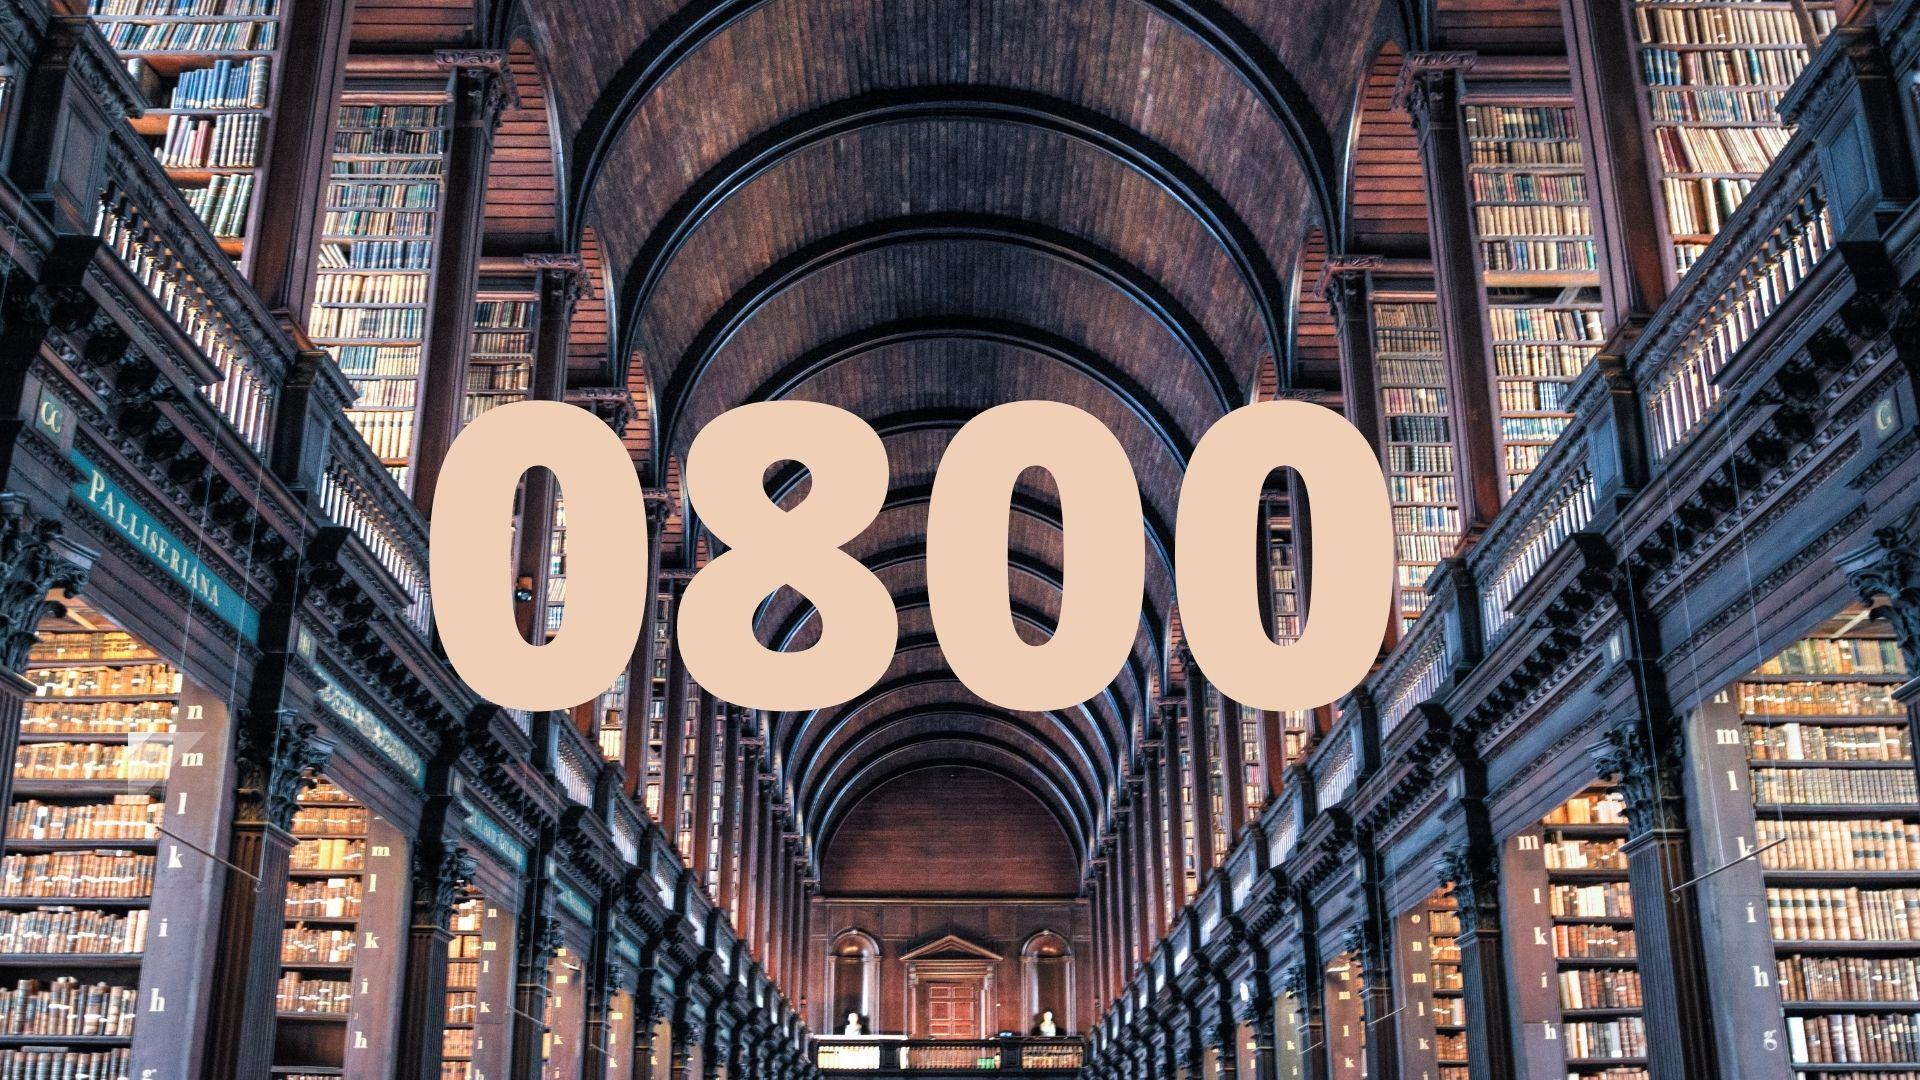 bibliothek über 0800